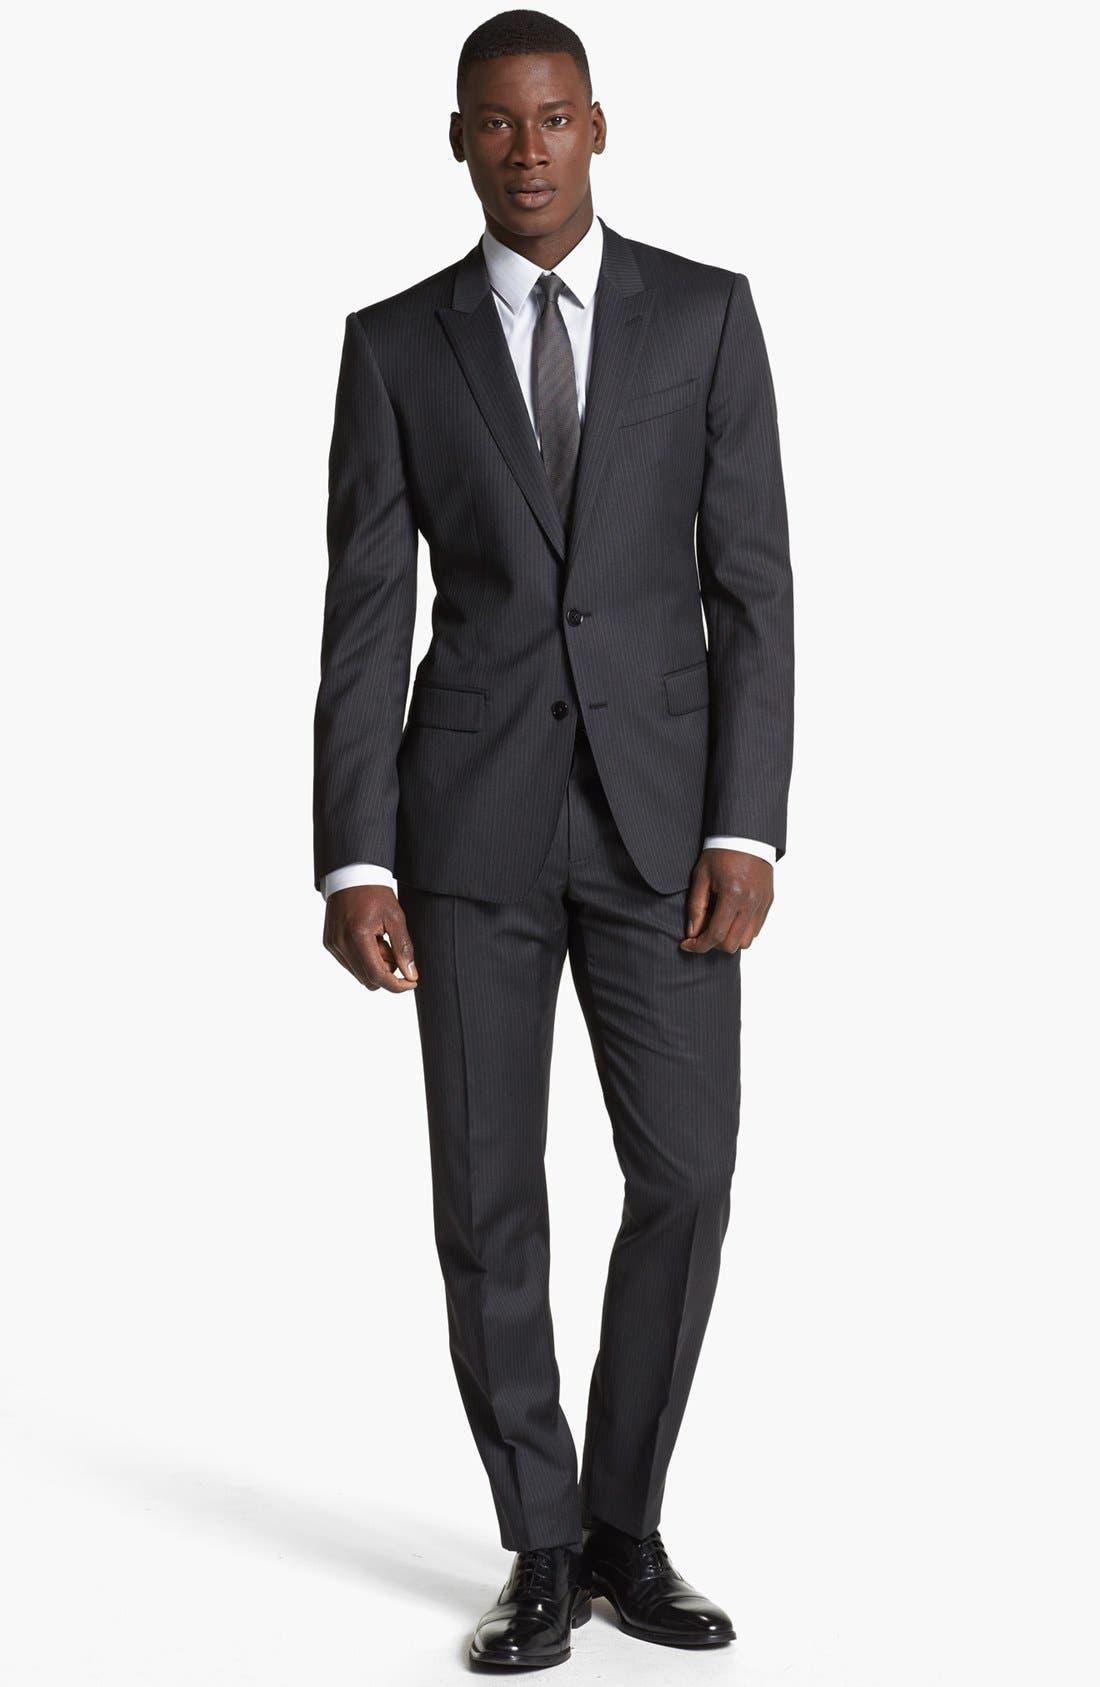 Alternate Image 1 Selected - Dolce&Gabbana 'Martini' Pinstripe Wool Suit